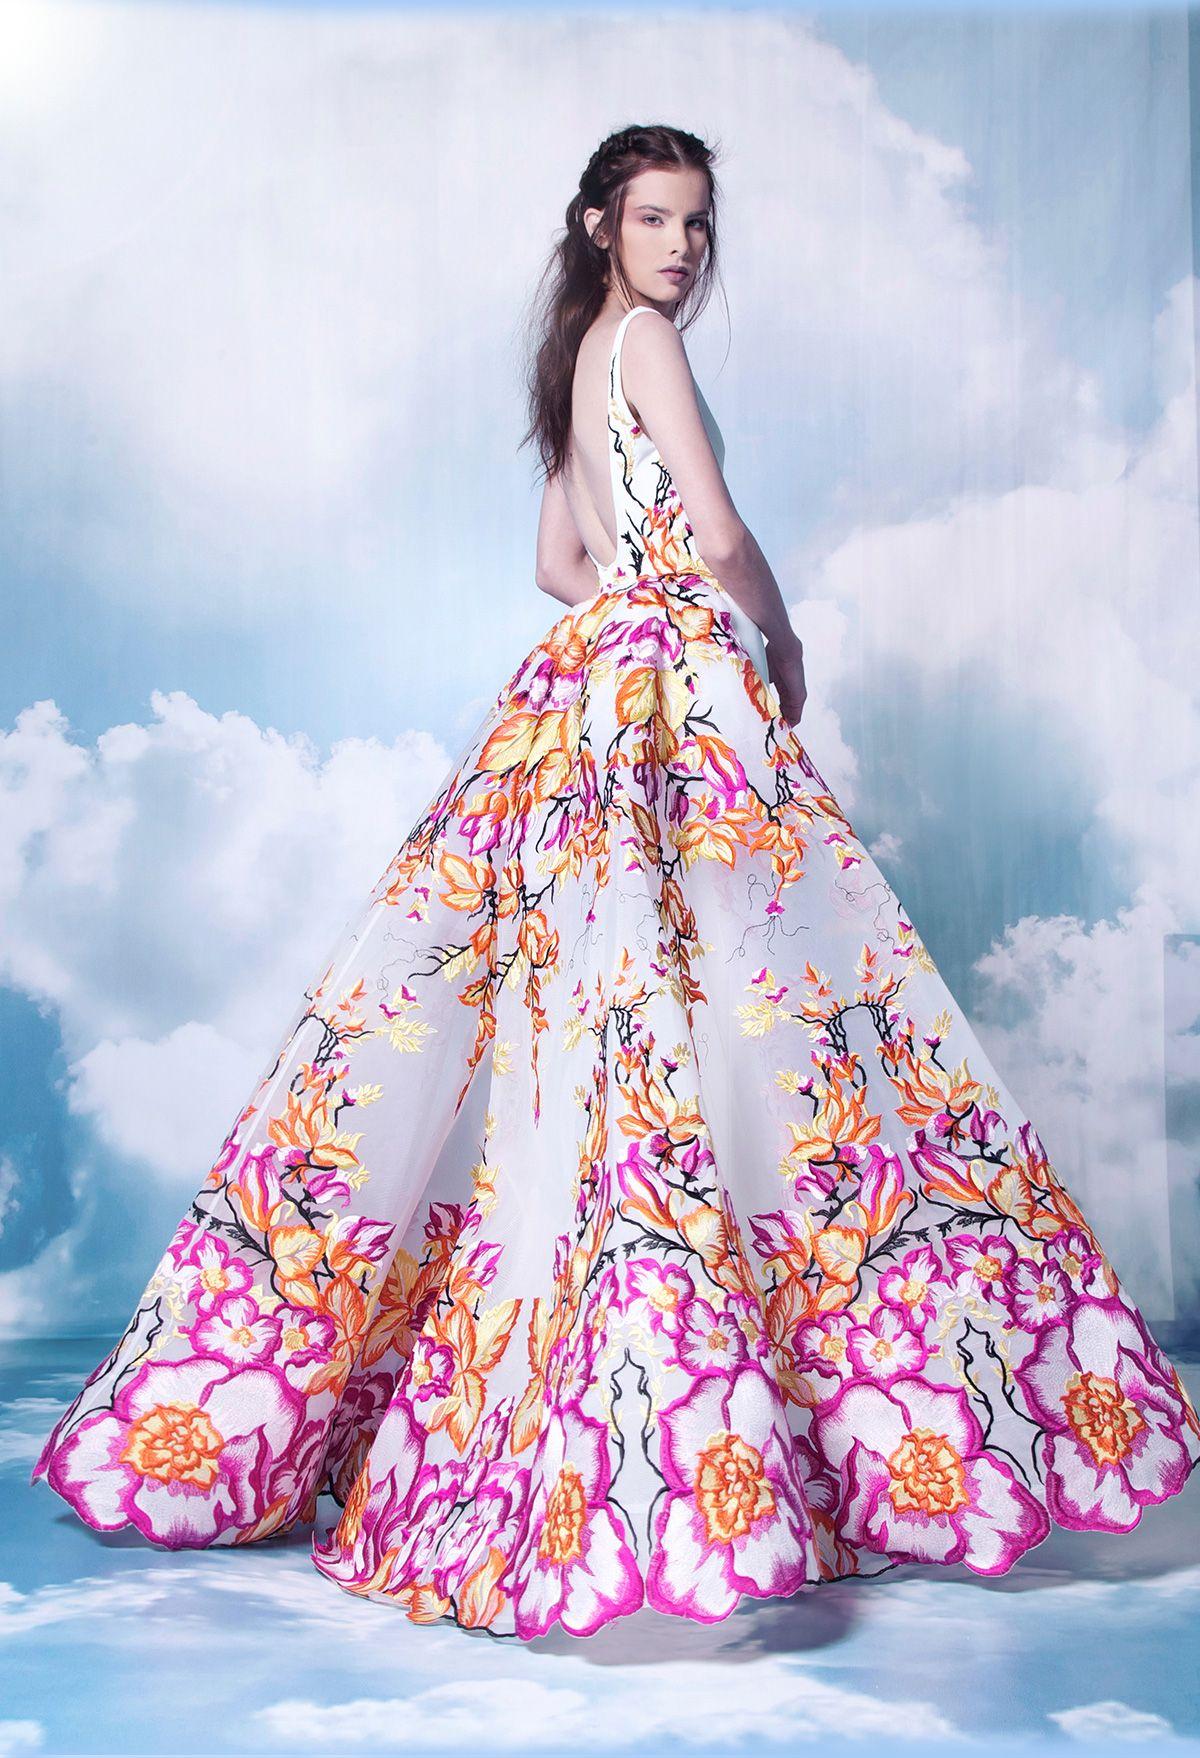 NICOLAS JEBRAN | Evening gowns | Pinterest